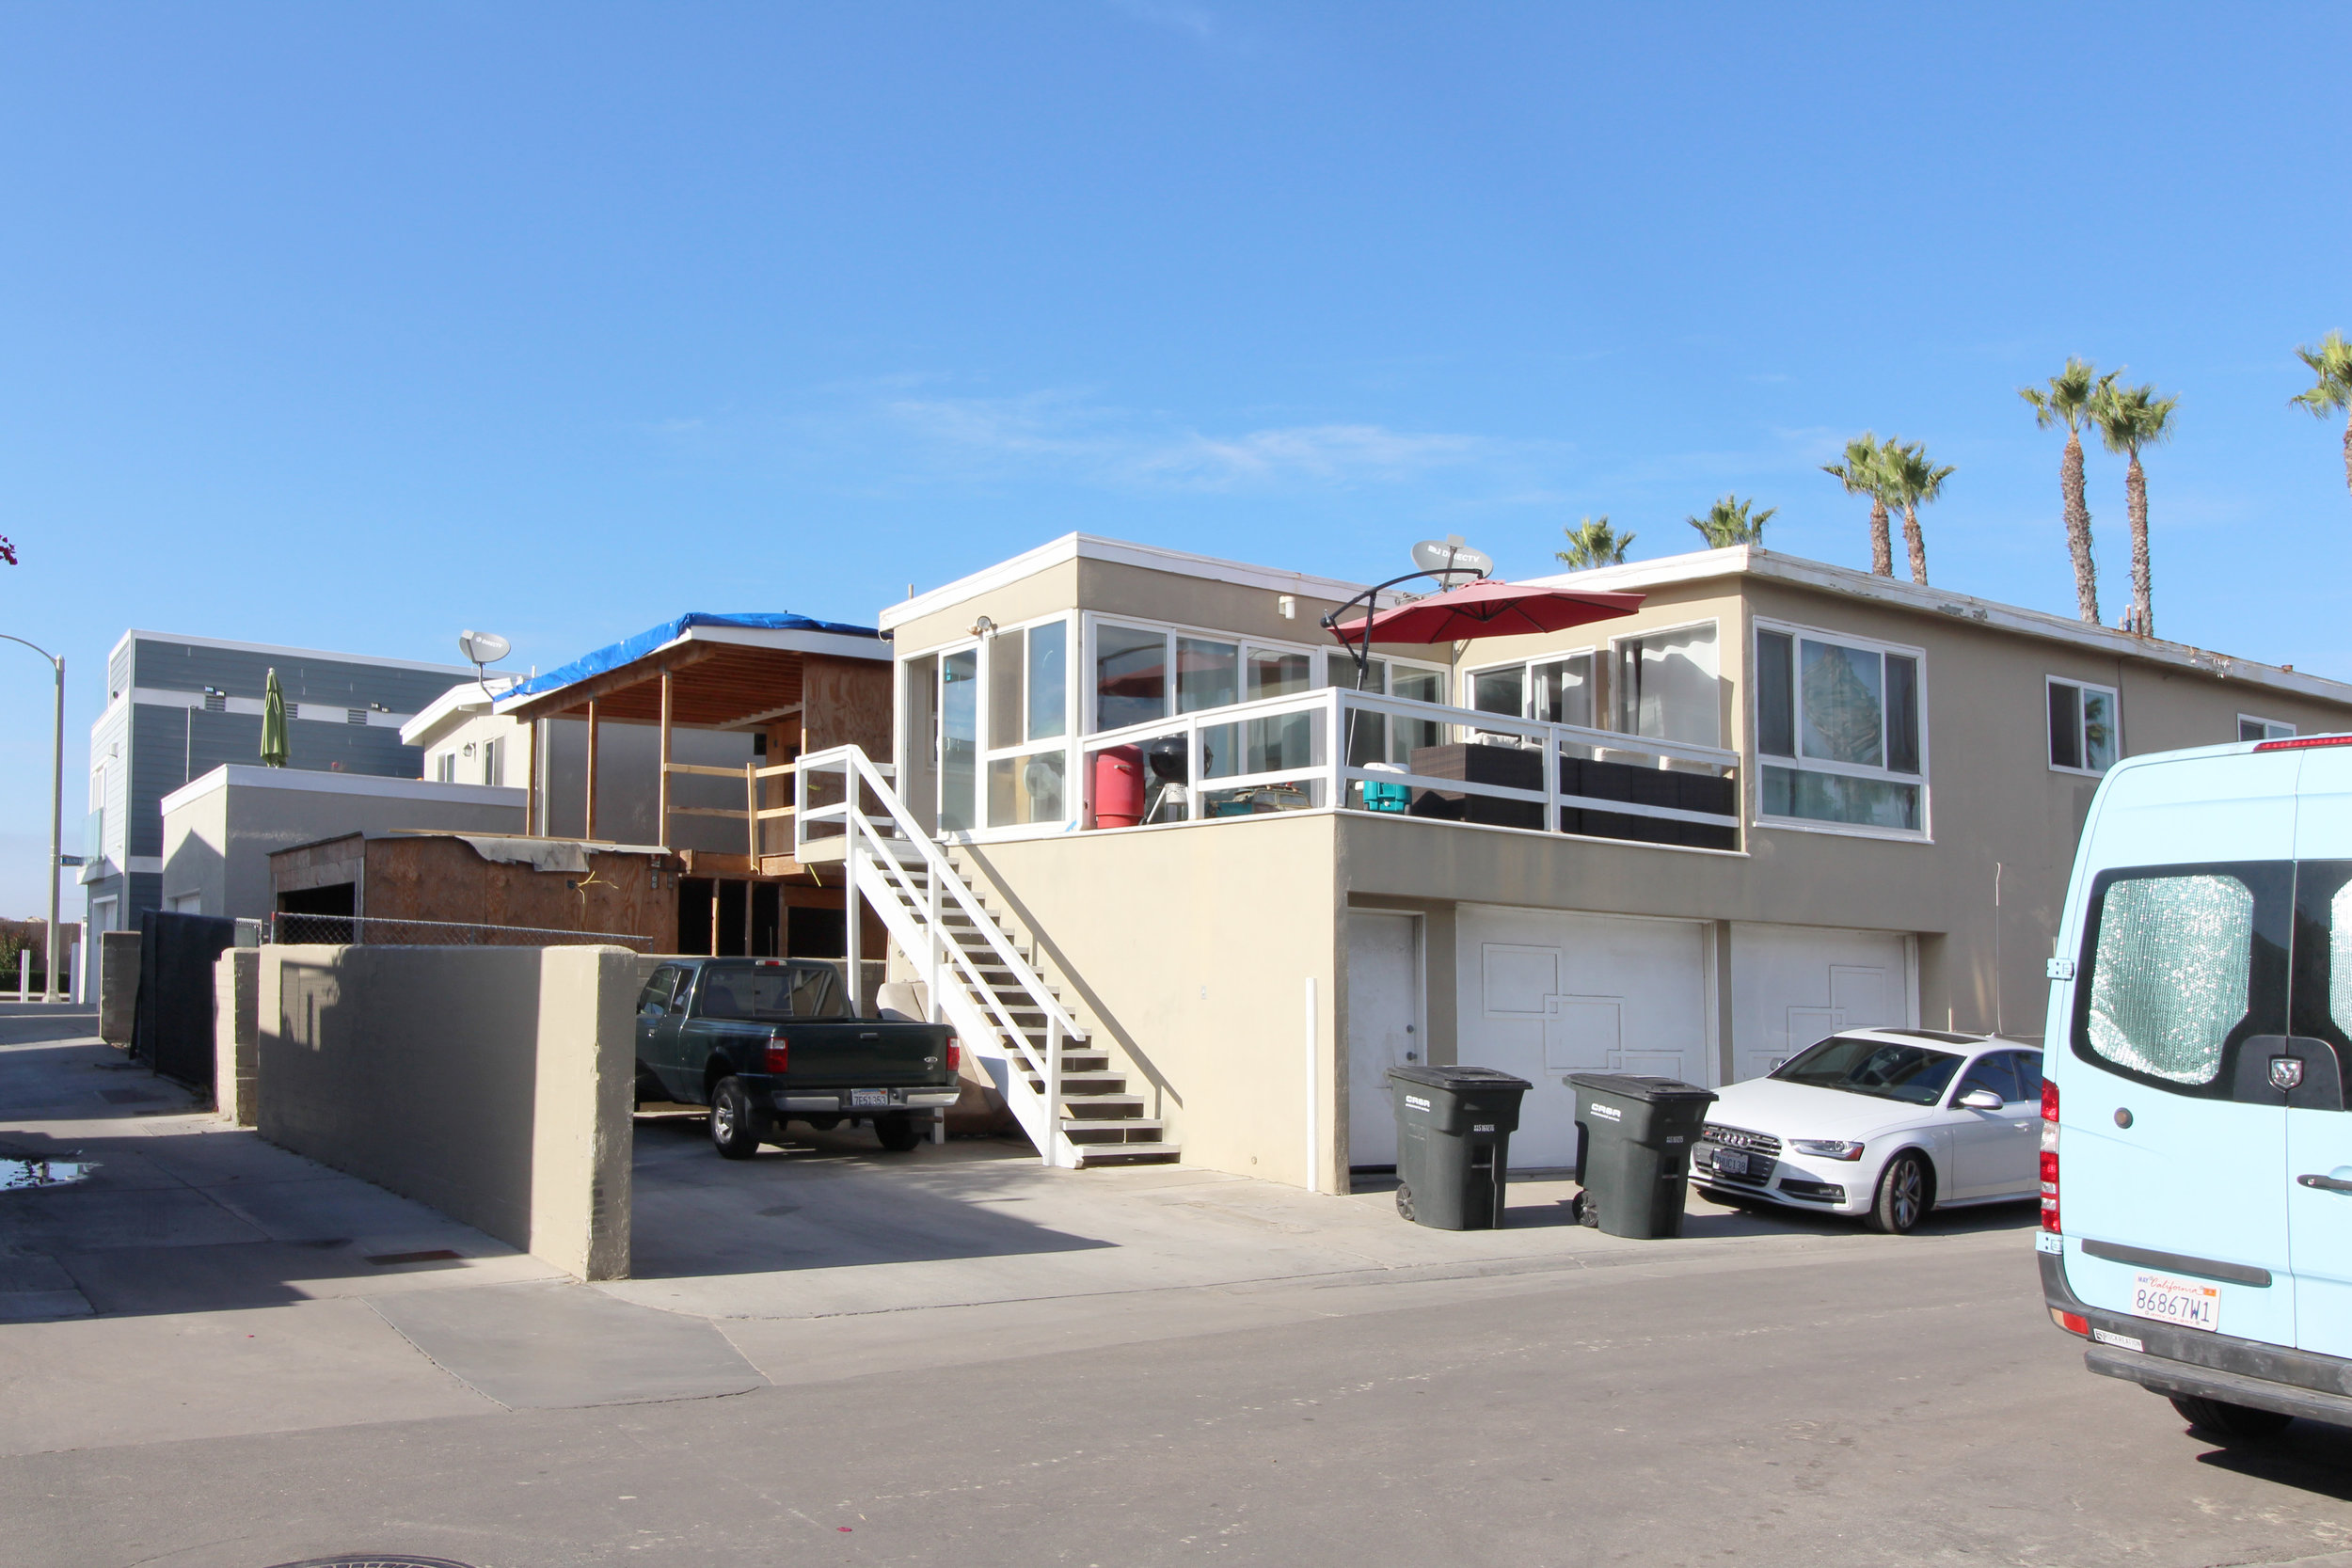 newport beach duplex remodel before.jpg